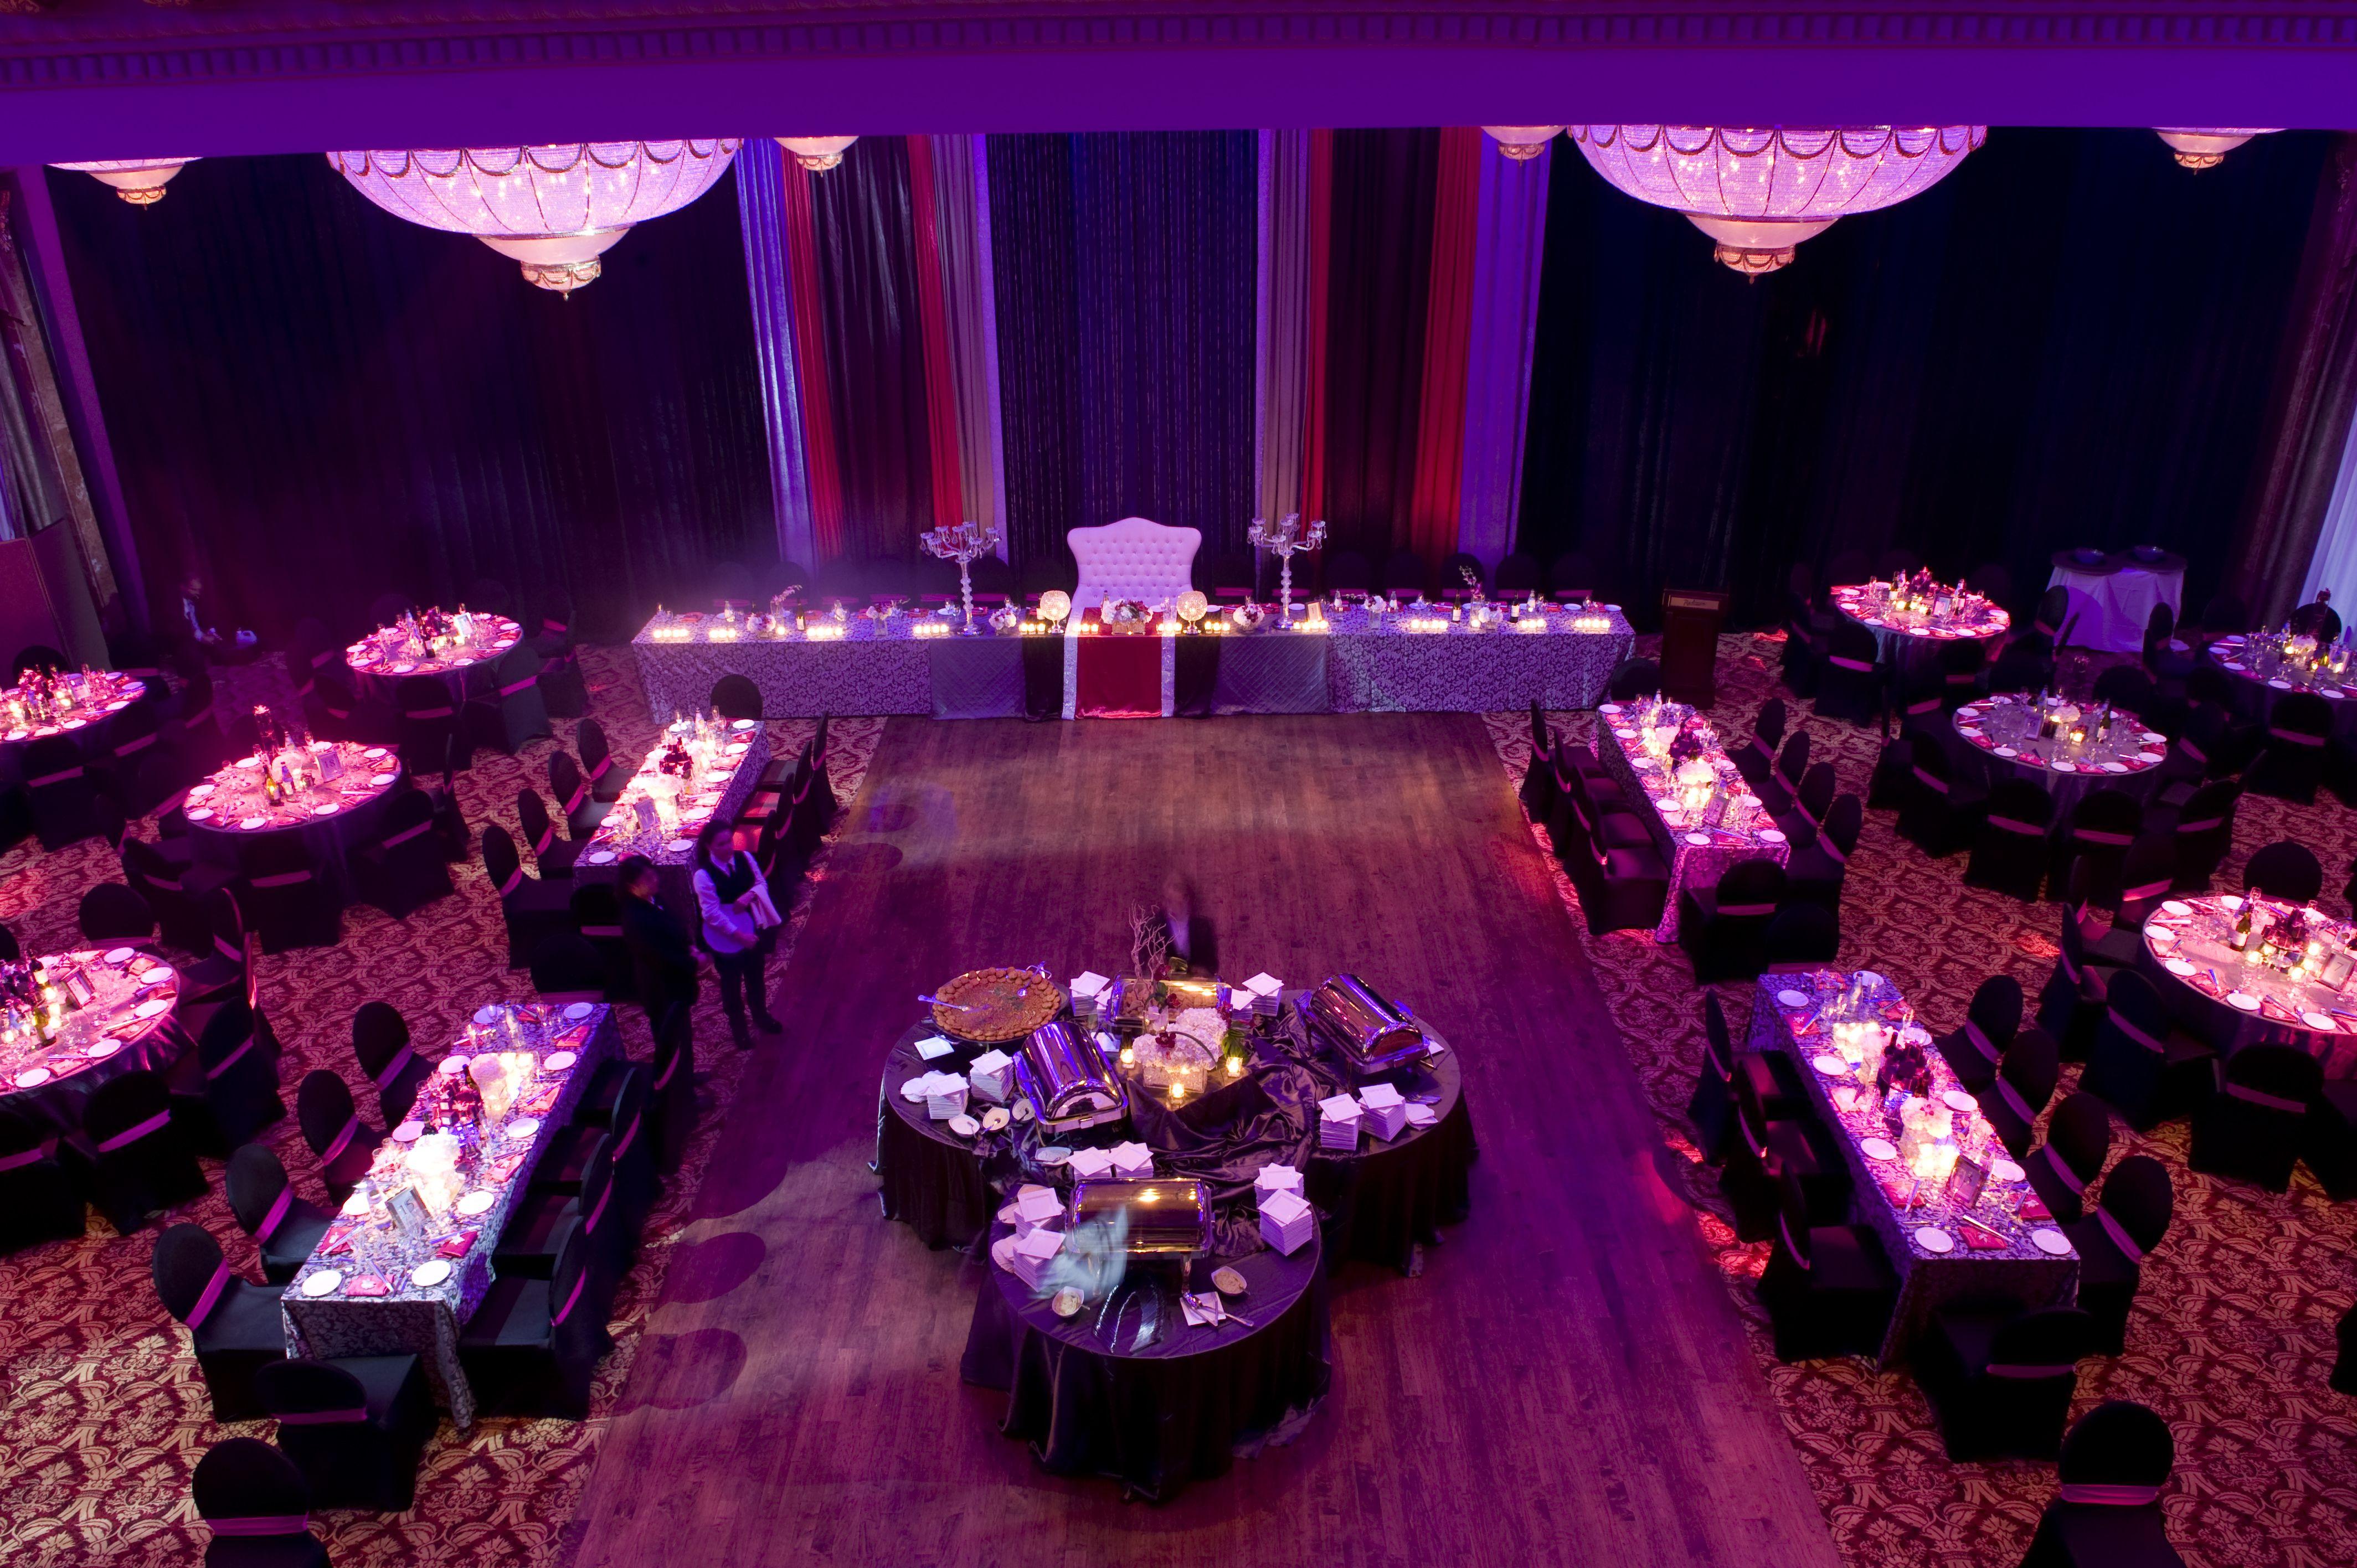 Top wedding venues in the gta purple themes reception and weddings fuschia wedding ideas fuschia and purple theme image from kumari photo design junglespirit Choice Image